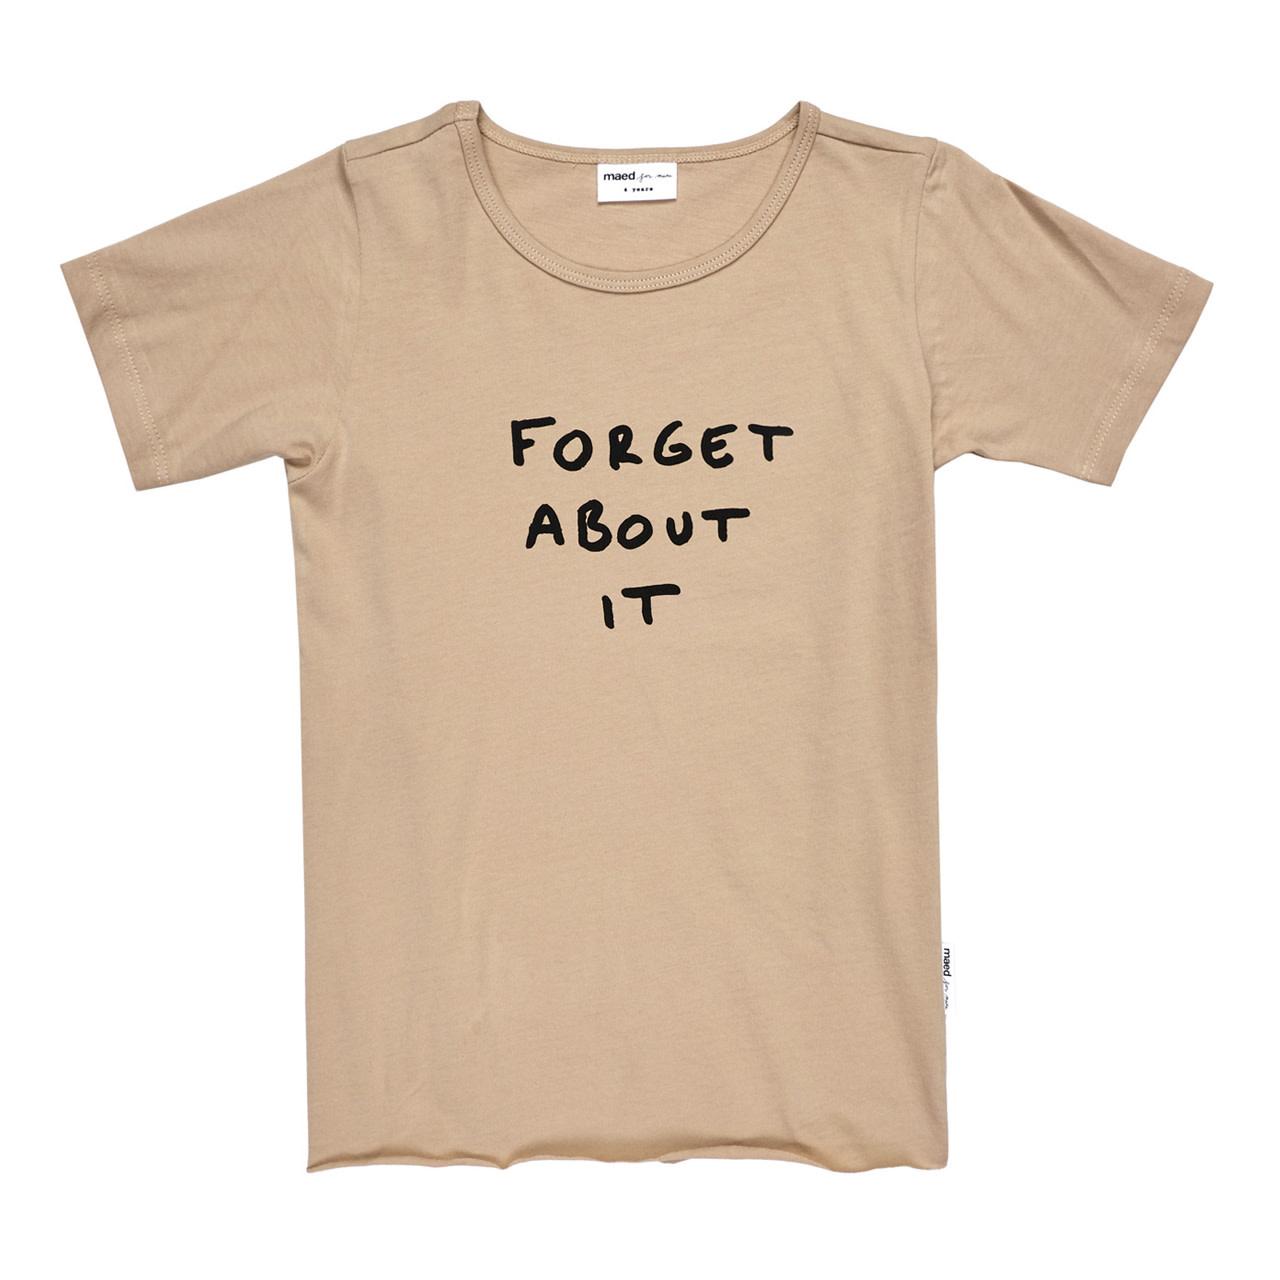 Maed For mini Maed for Mini - Chill Chihuahua T-shirt